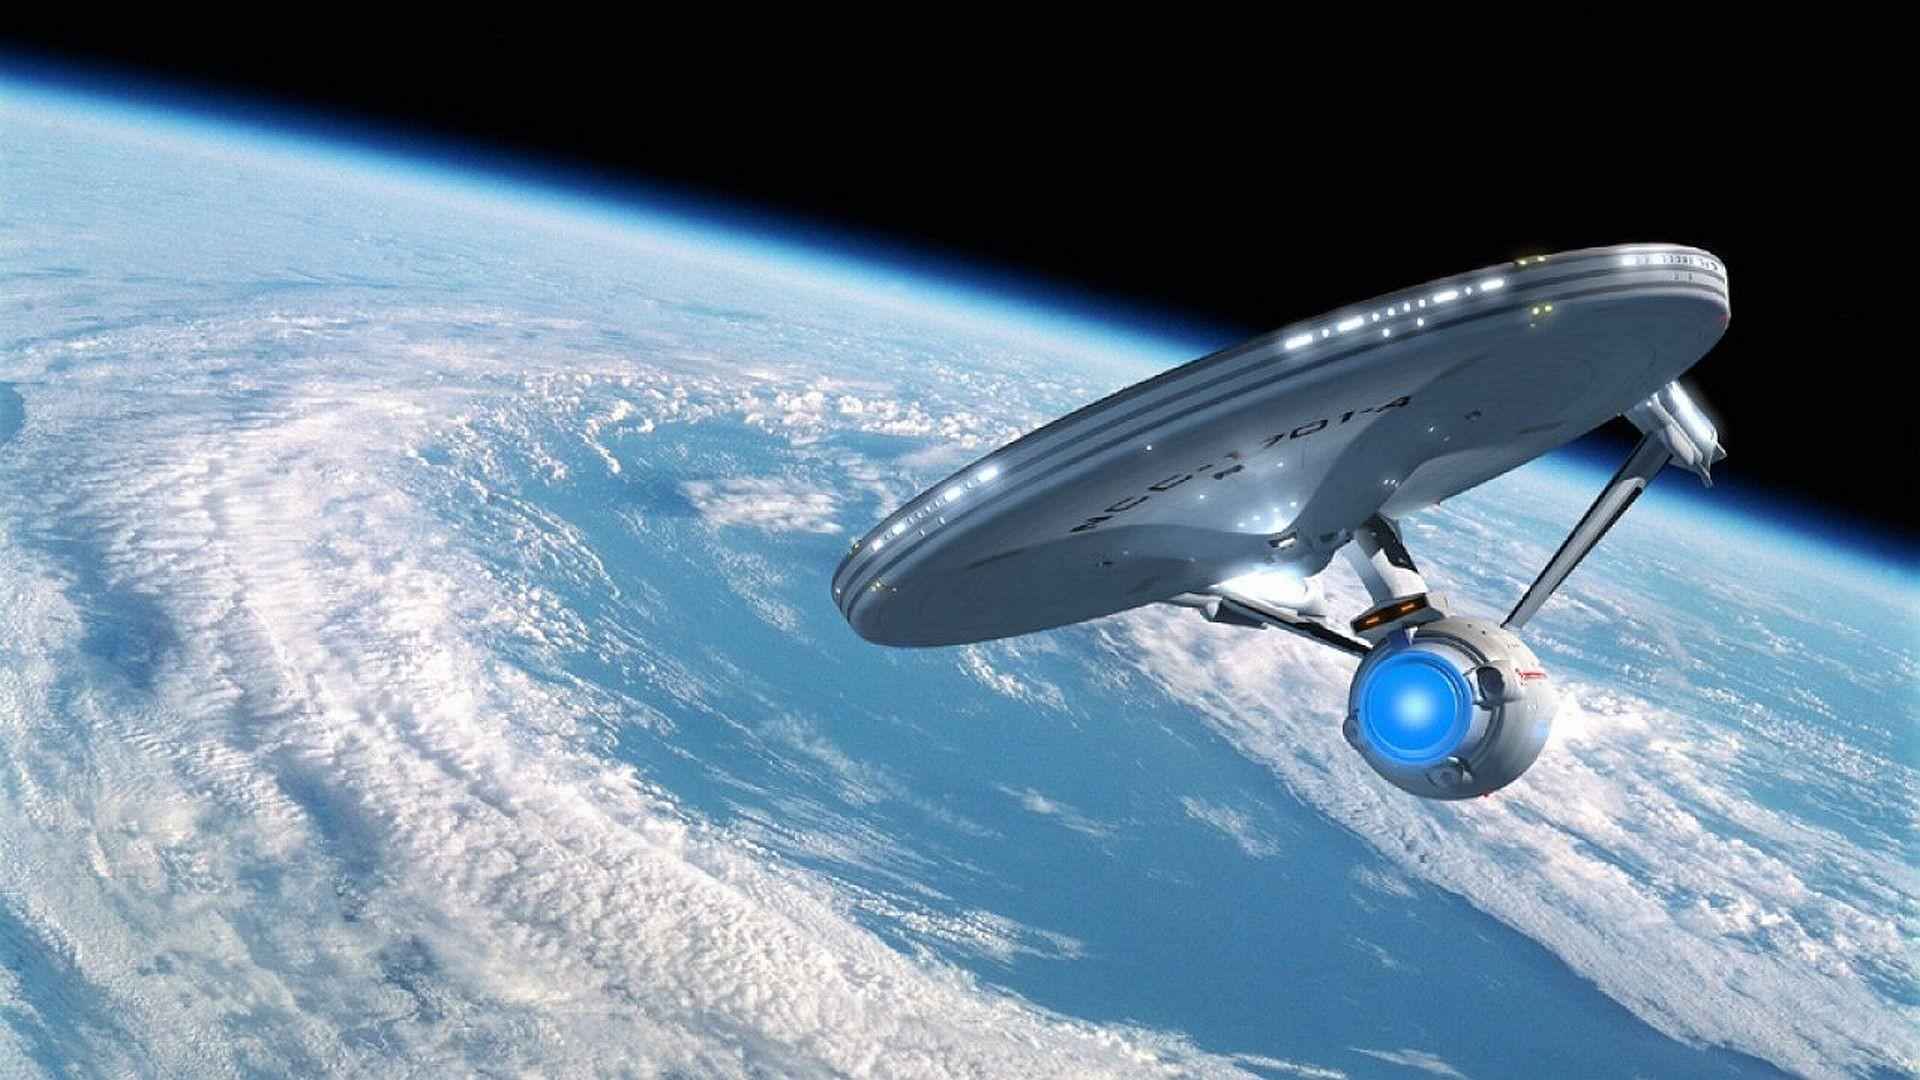 Populaire Star Trek Enterprise Wallpaper HD (70+ images) OE04